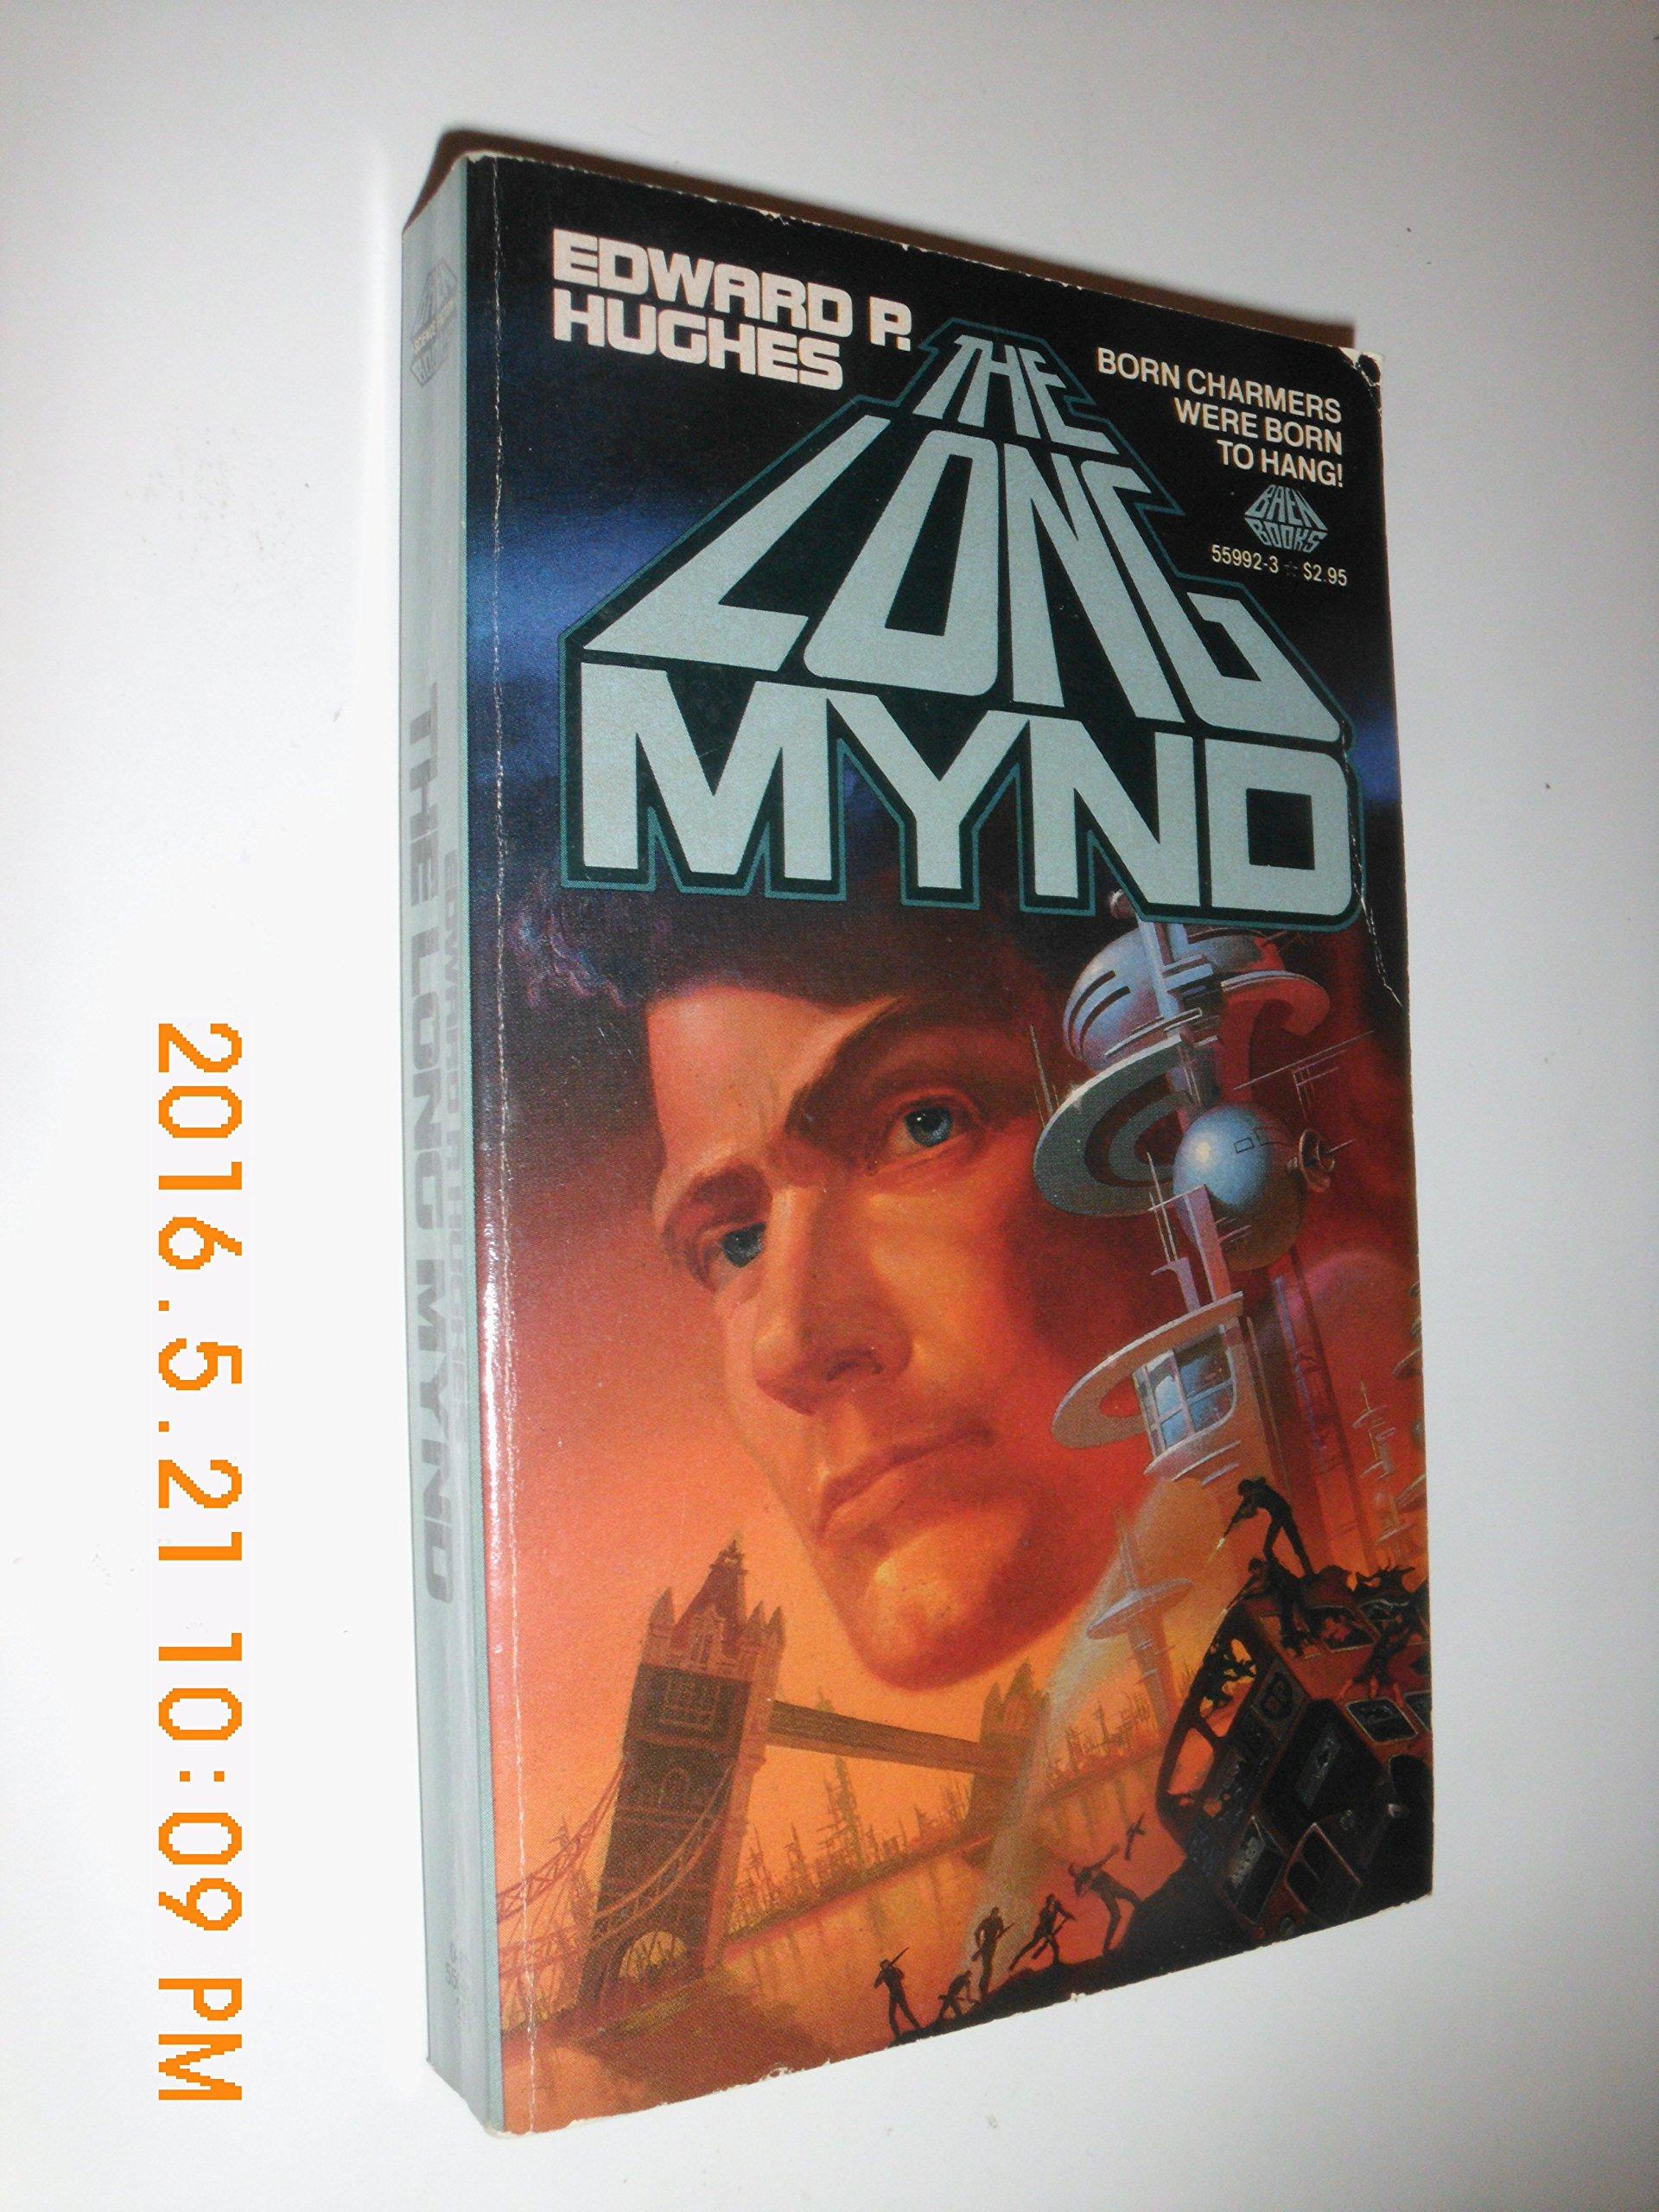 The Long Mynd by Edward P. Hughes